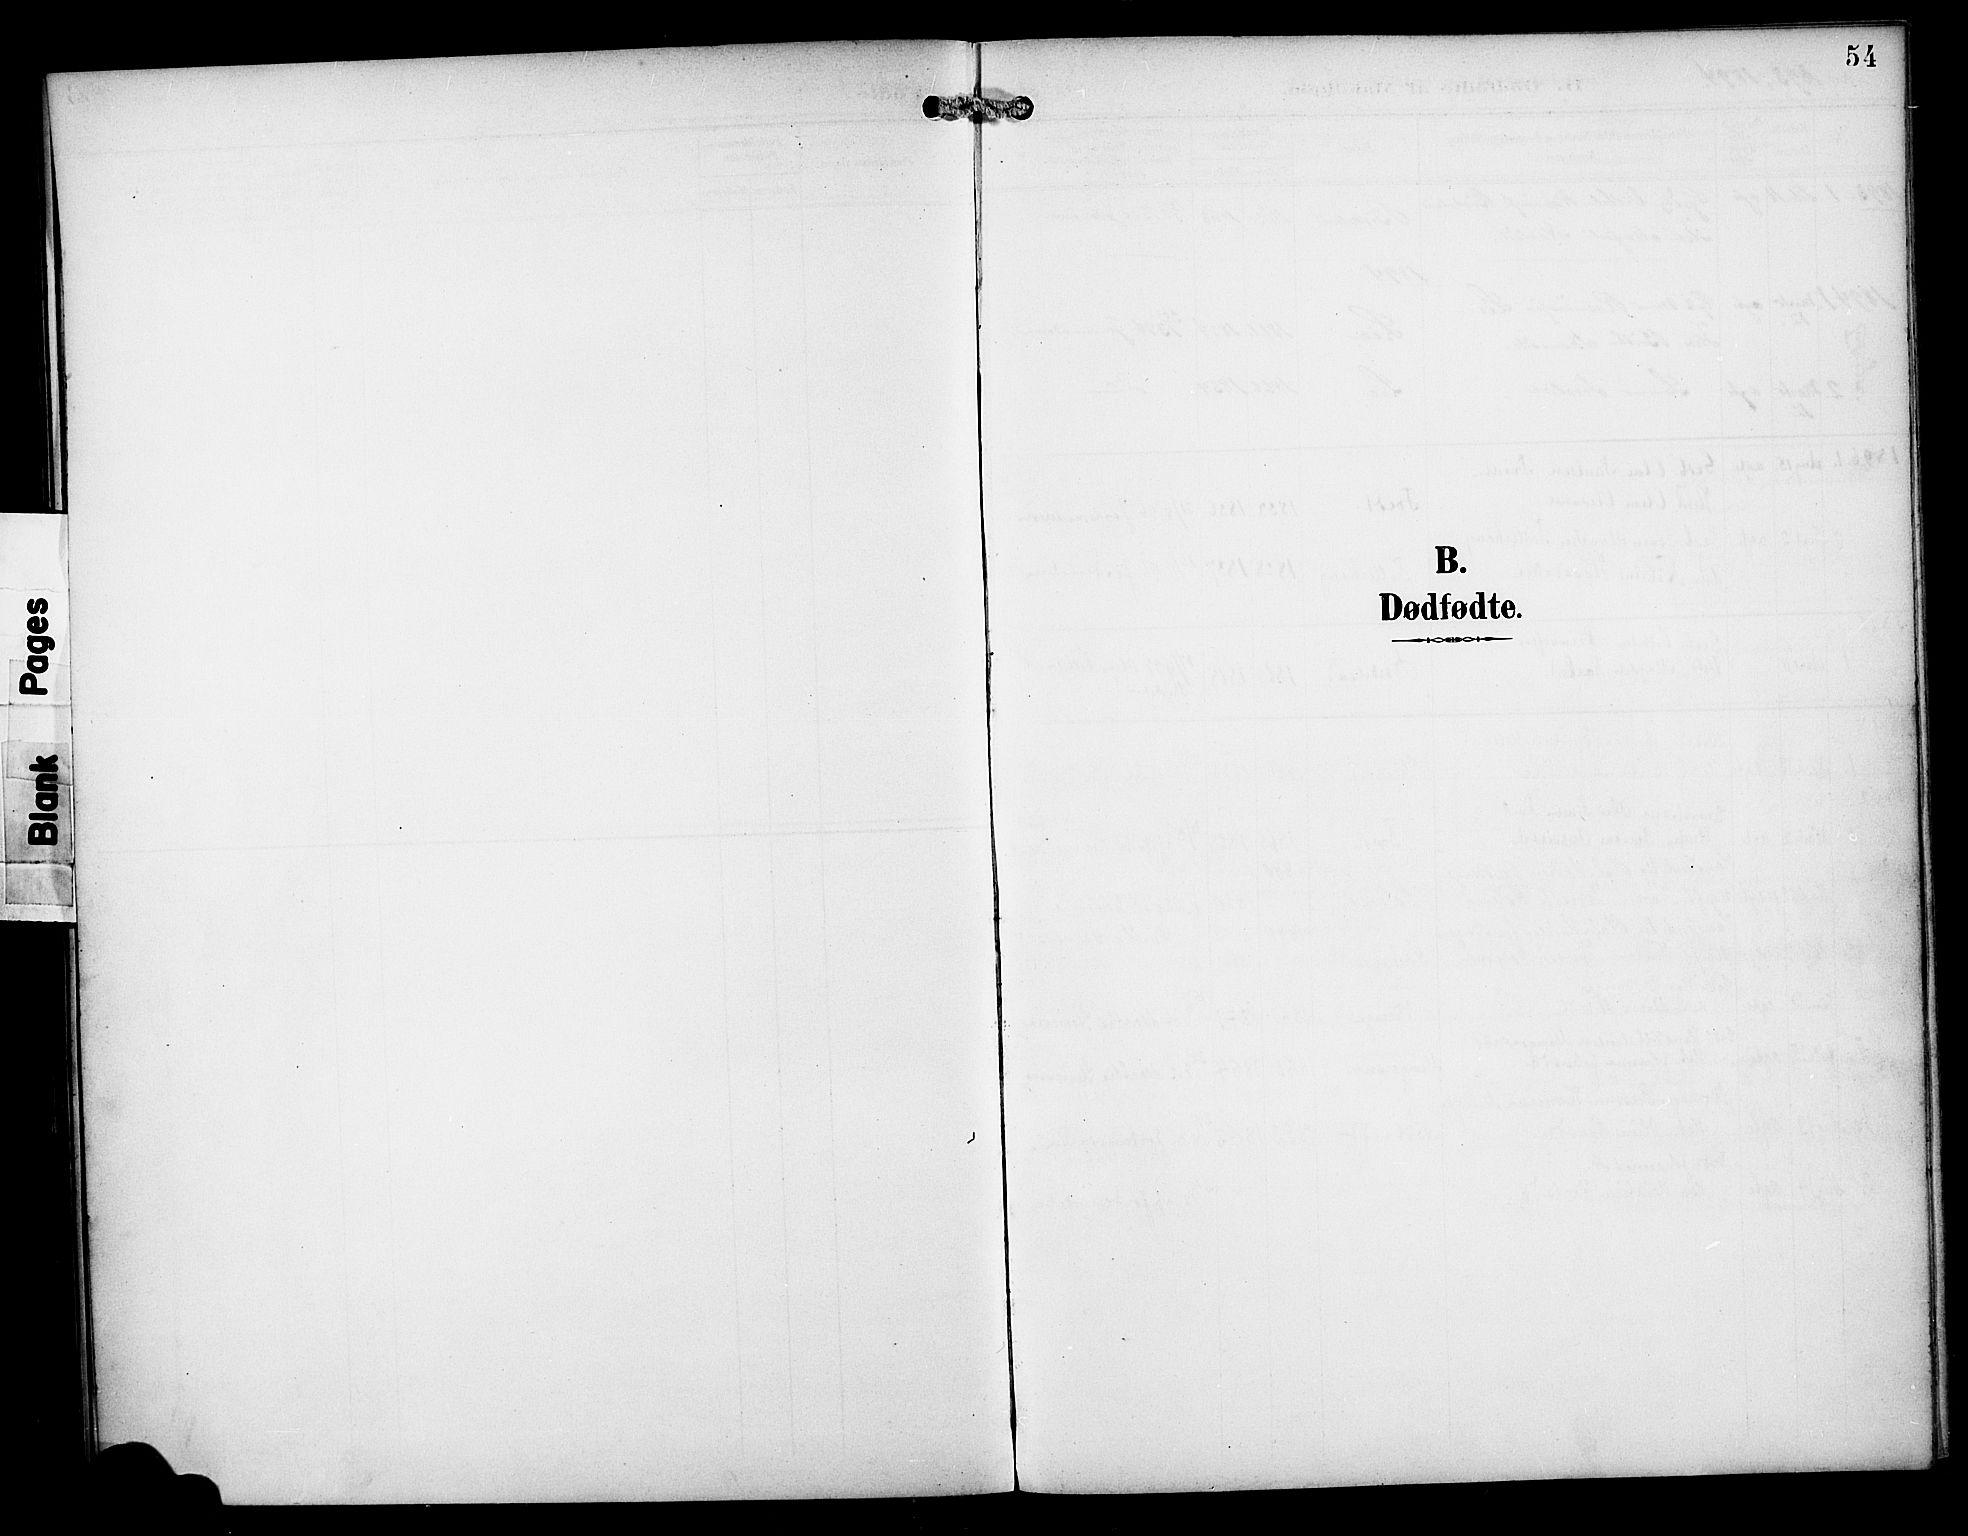 SAB, Manger sokneprestembete, H/Haa: Ministerialbok nr. B 2, 1893-1906, s. 54